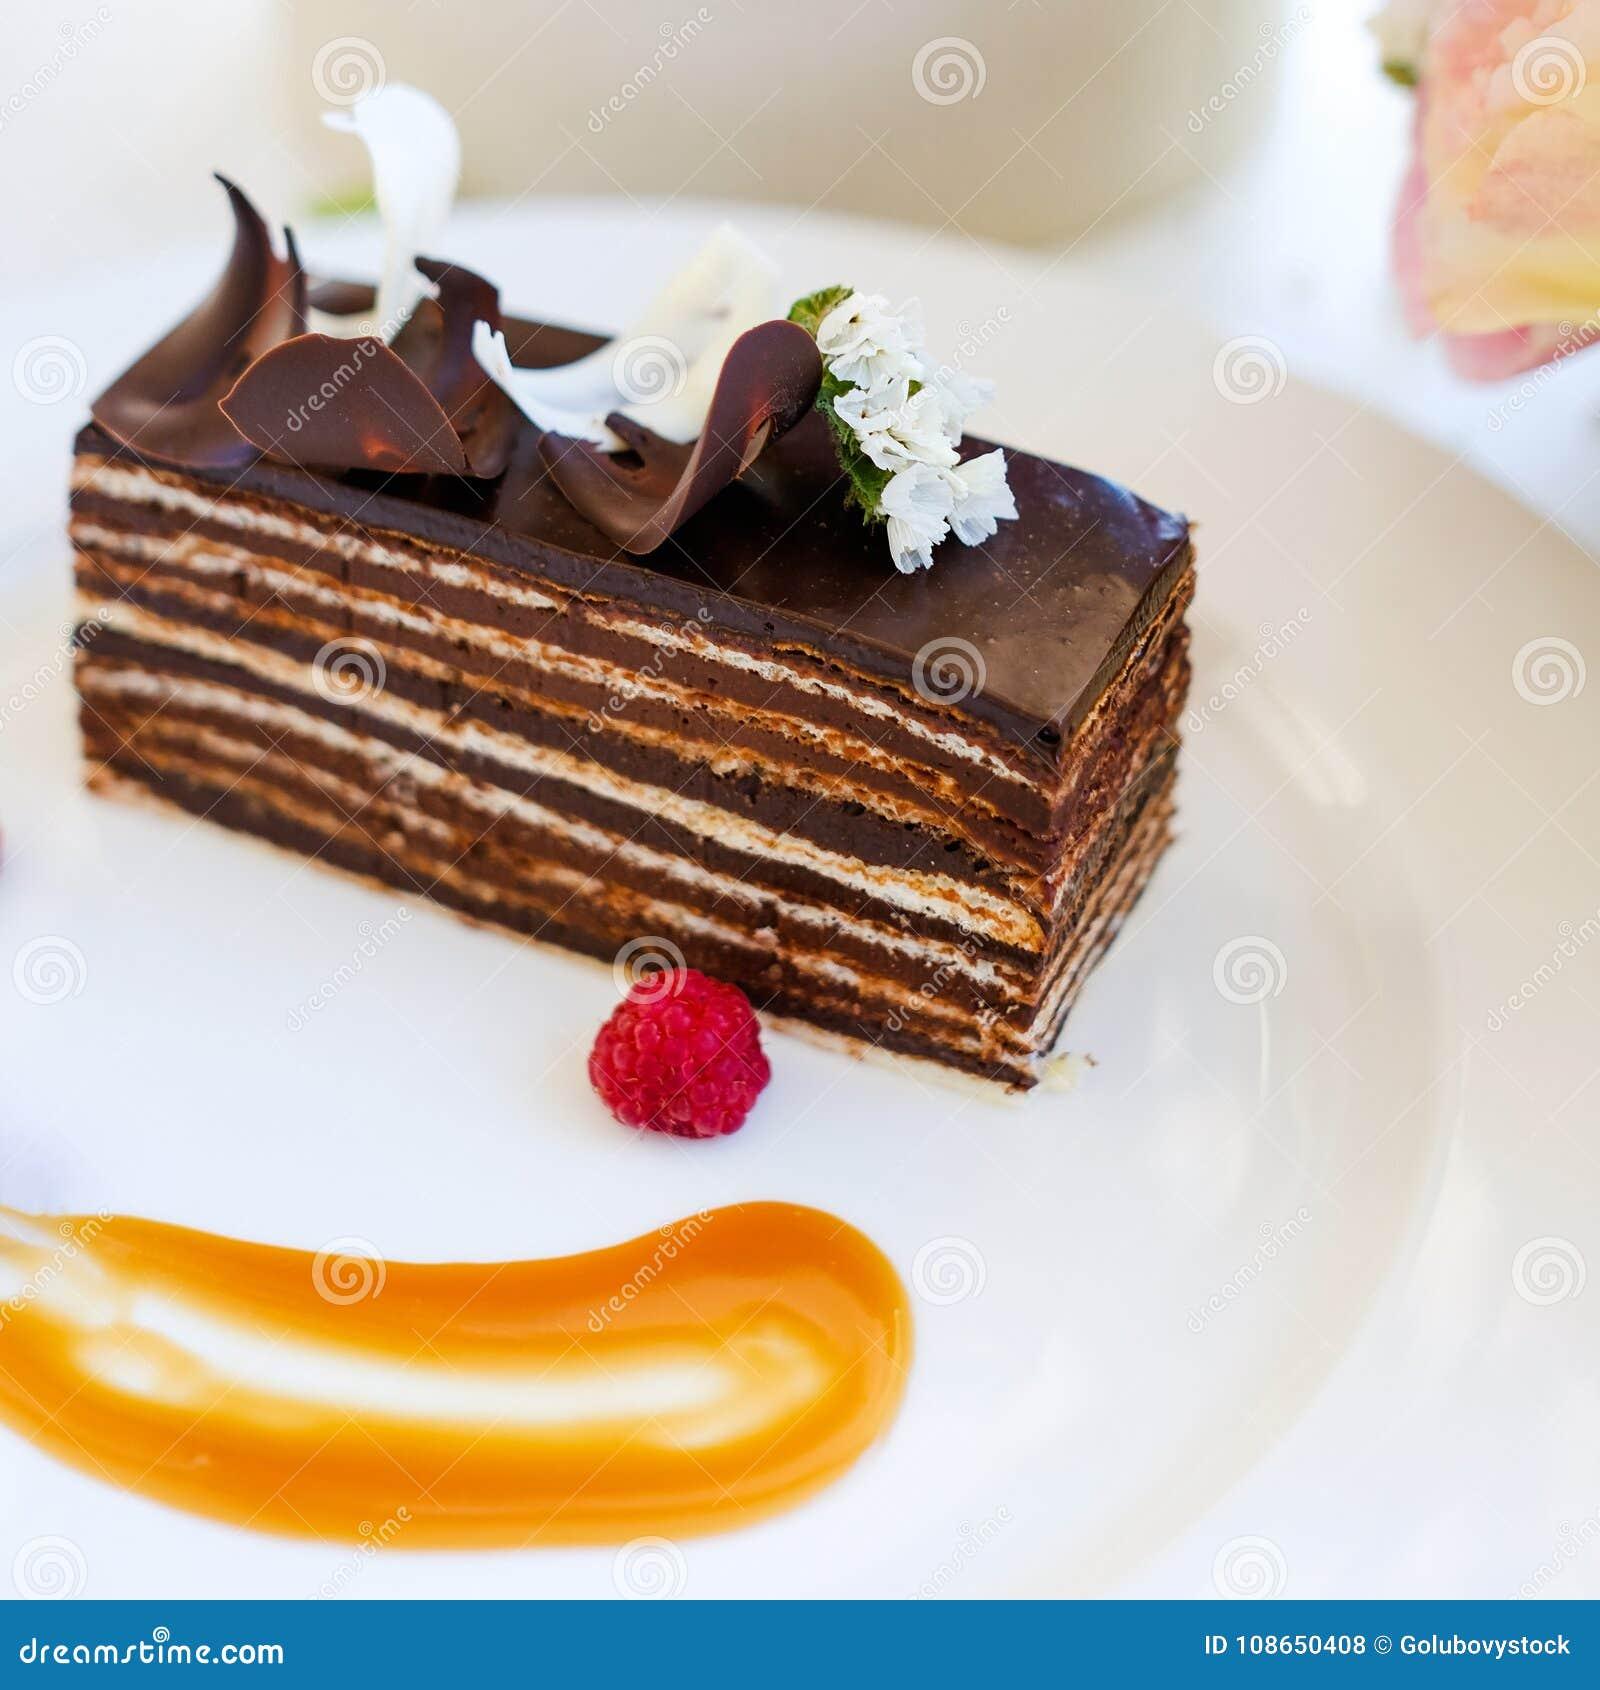 Tasty Chocolate Cake Dessert Recipe Stock Photo - Image of ...